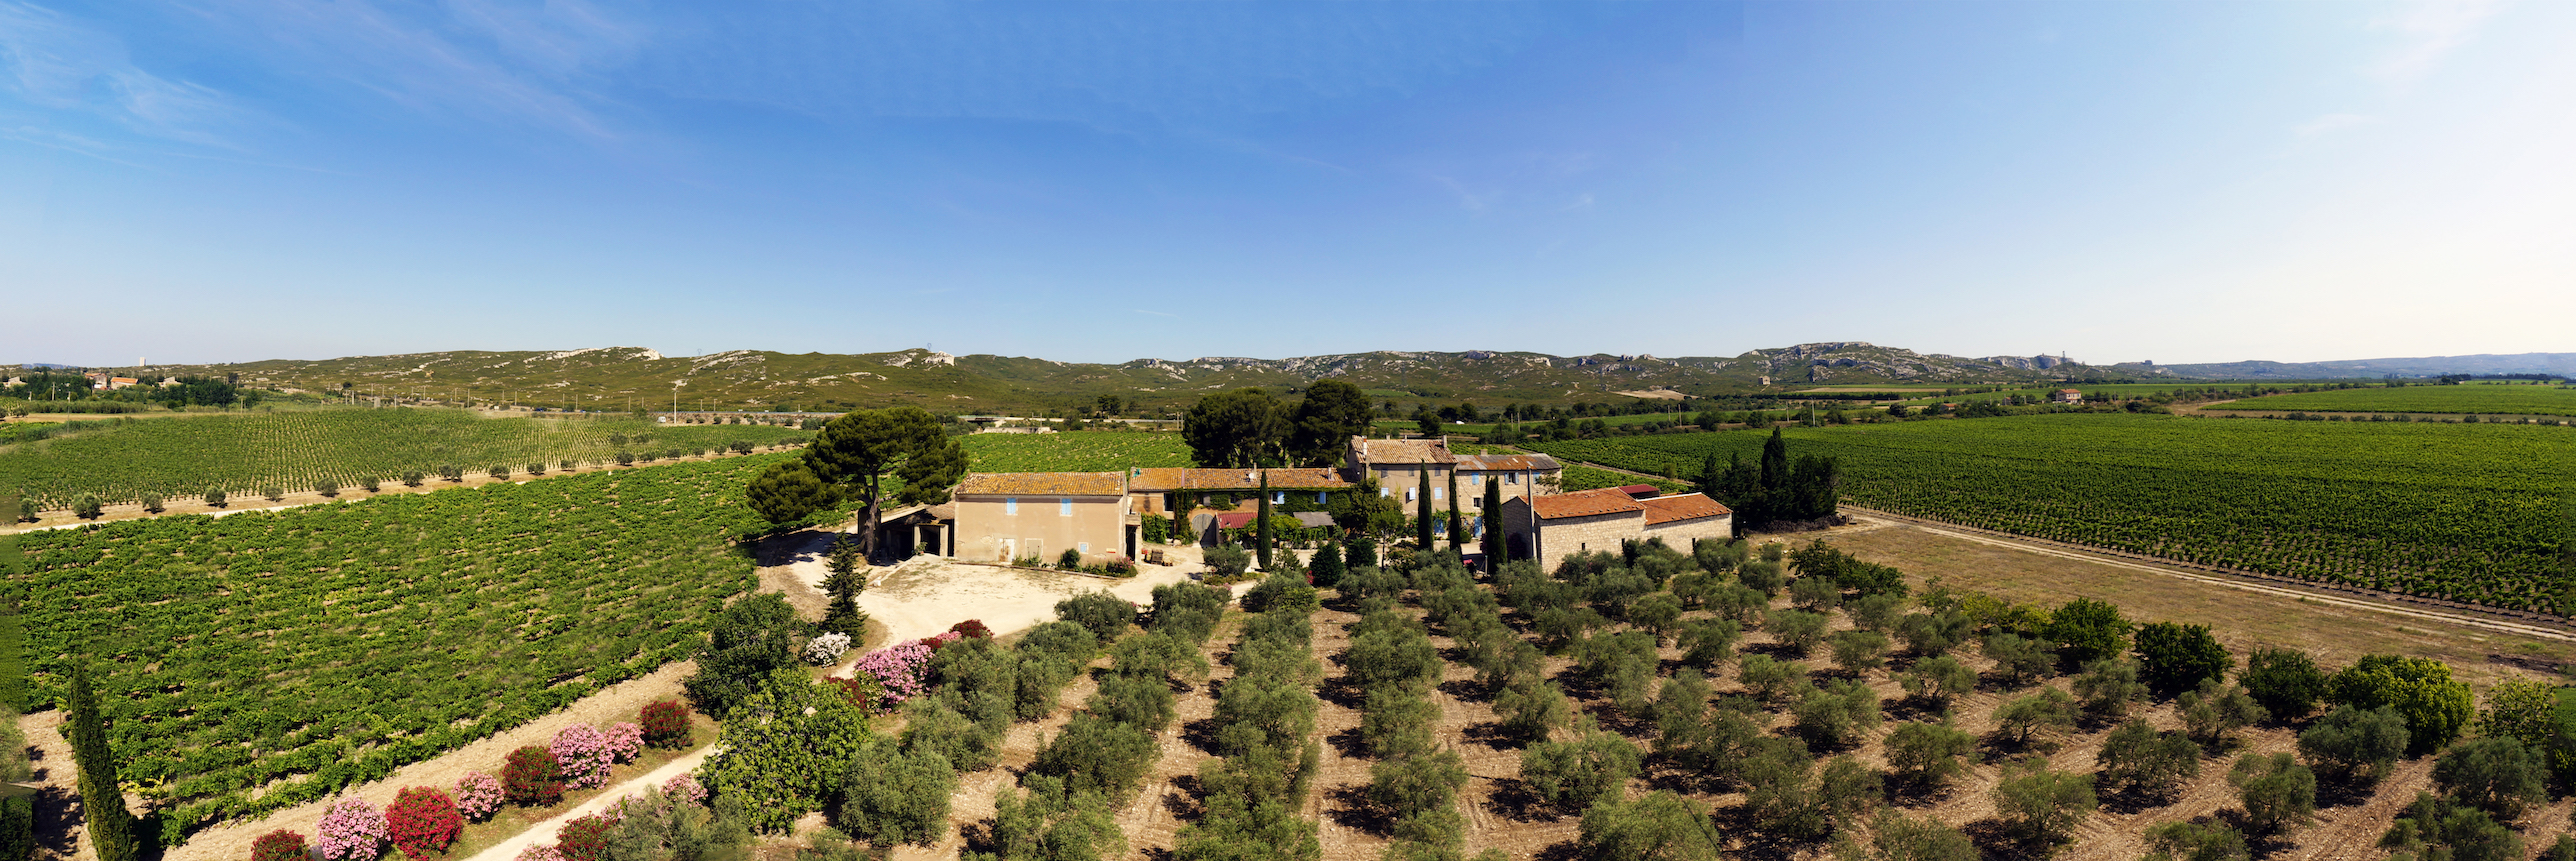 Panorama ferme Suriane_©DomainedeSuriane